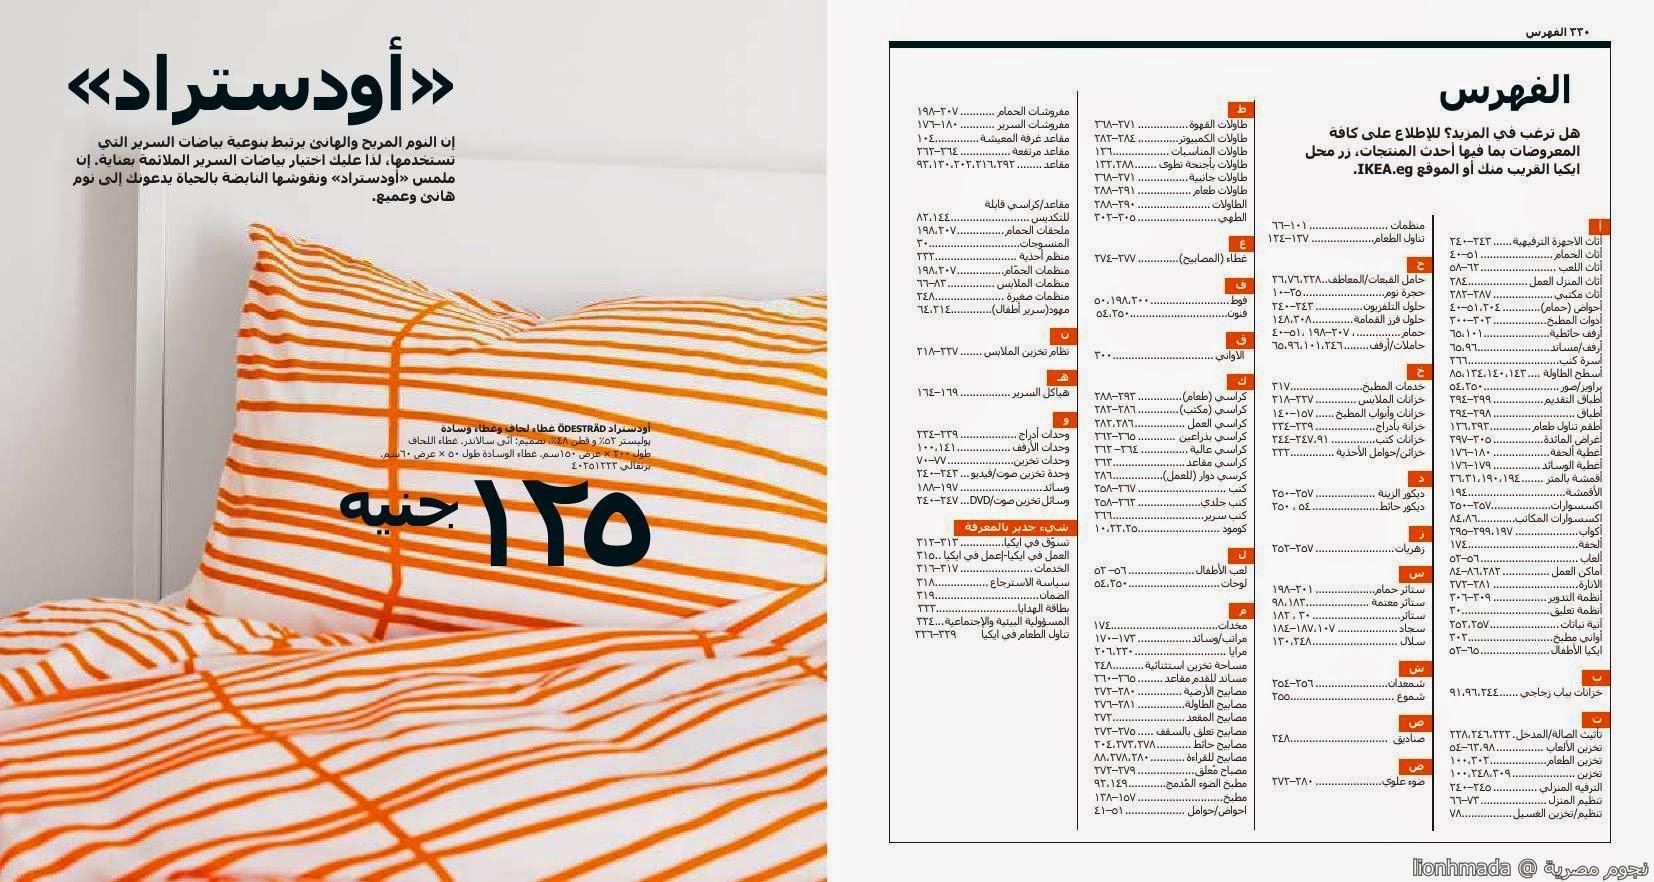 img97e21bdd452173bdebefebec28059279 صور كتالوج ايكيا مصر ikia للديكورات